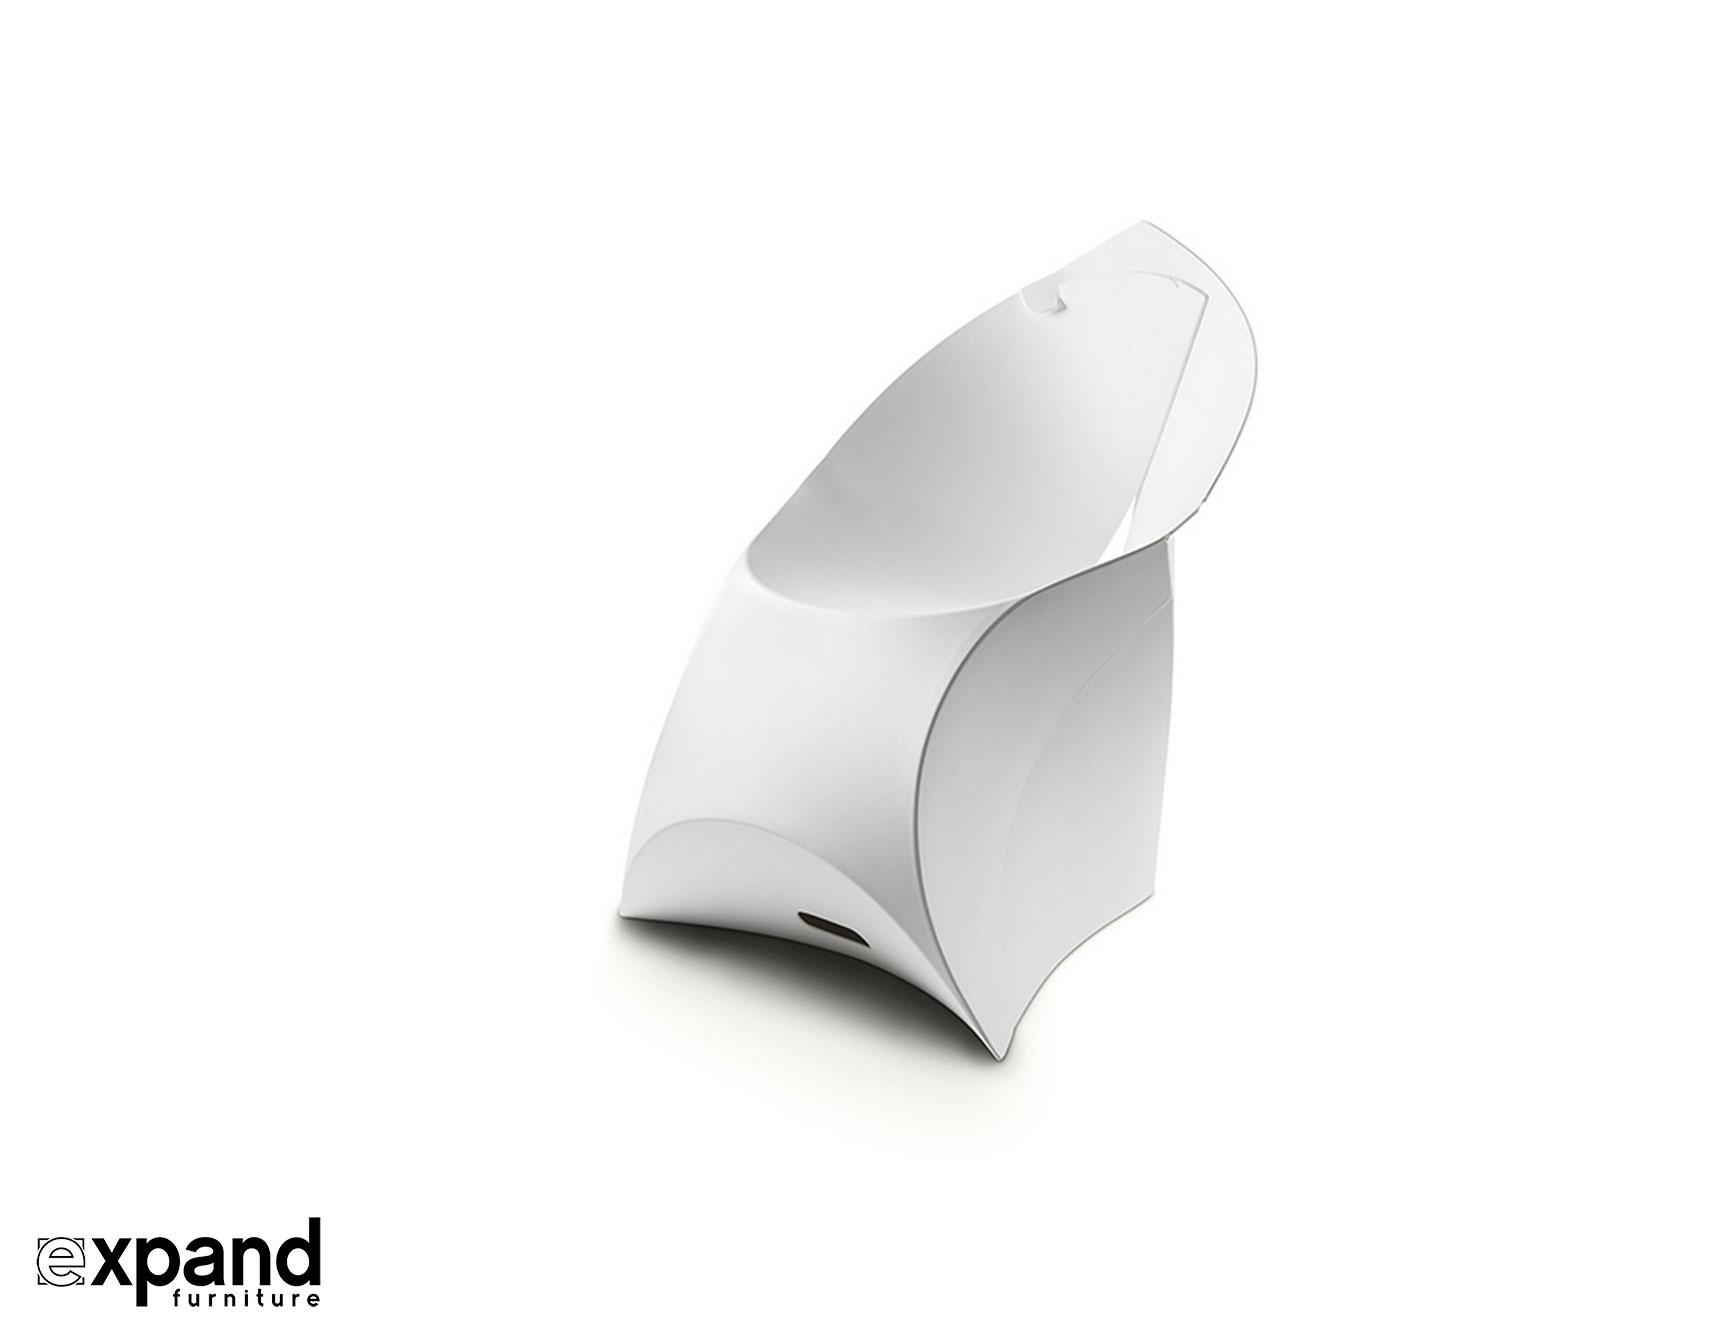 Flux Envelope Folding Chair Set Expand Furniture